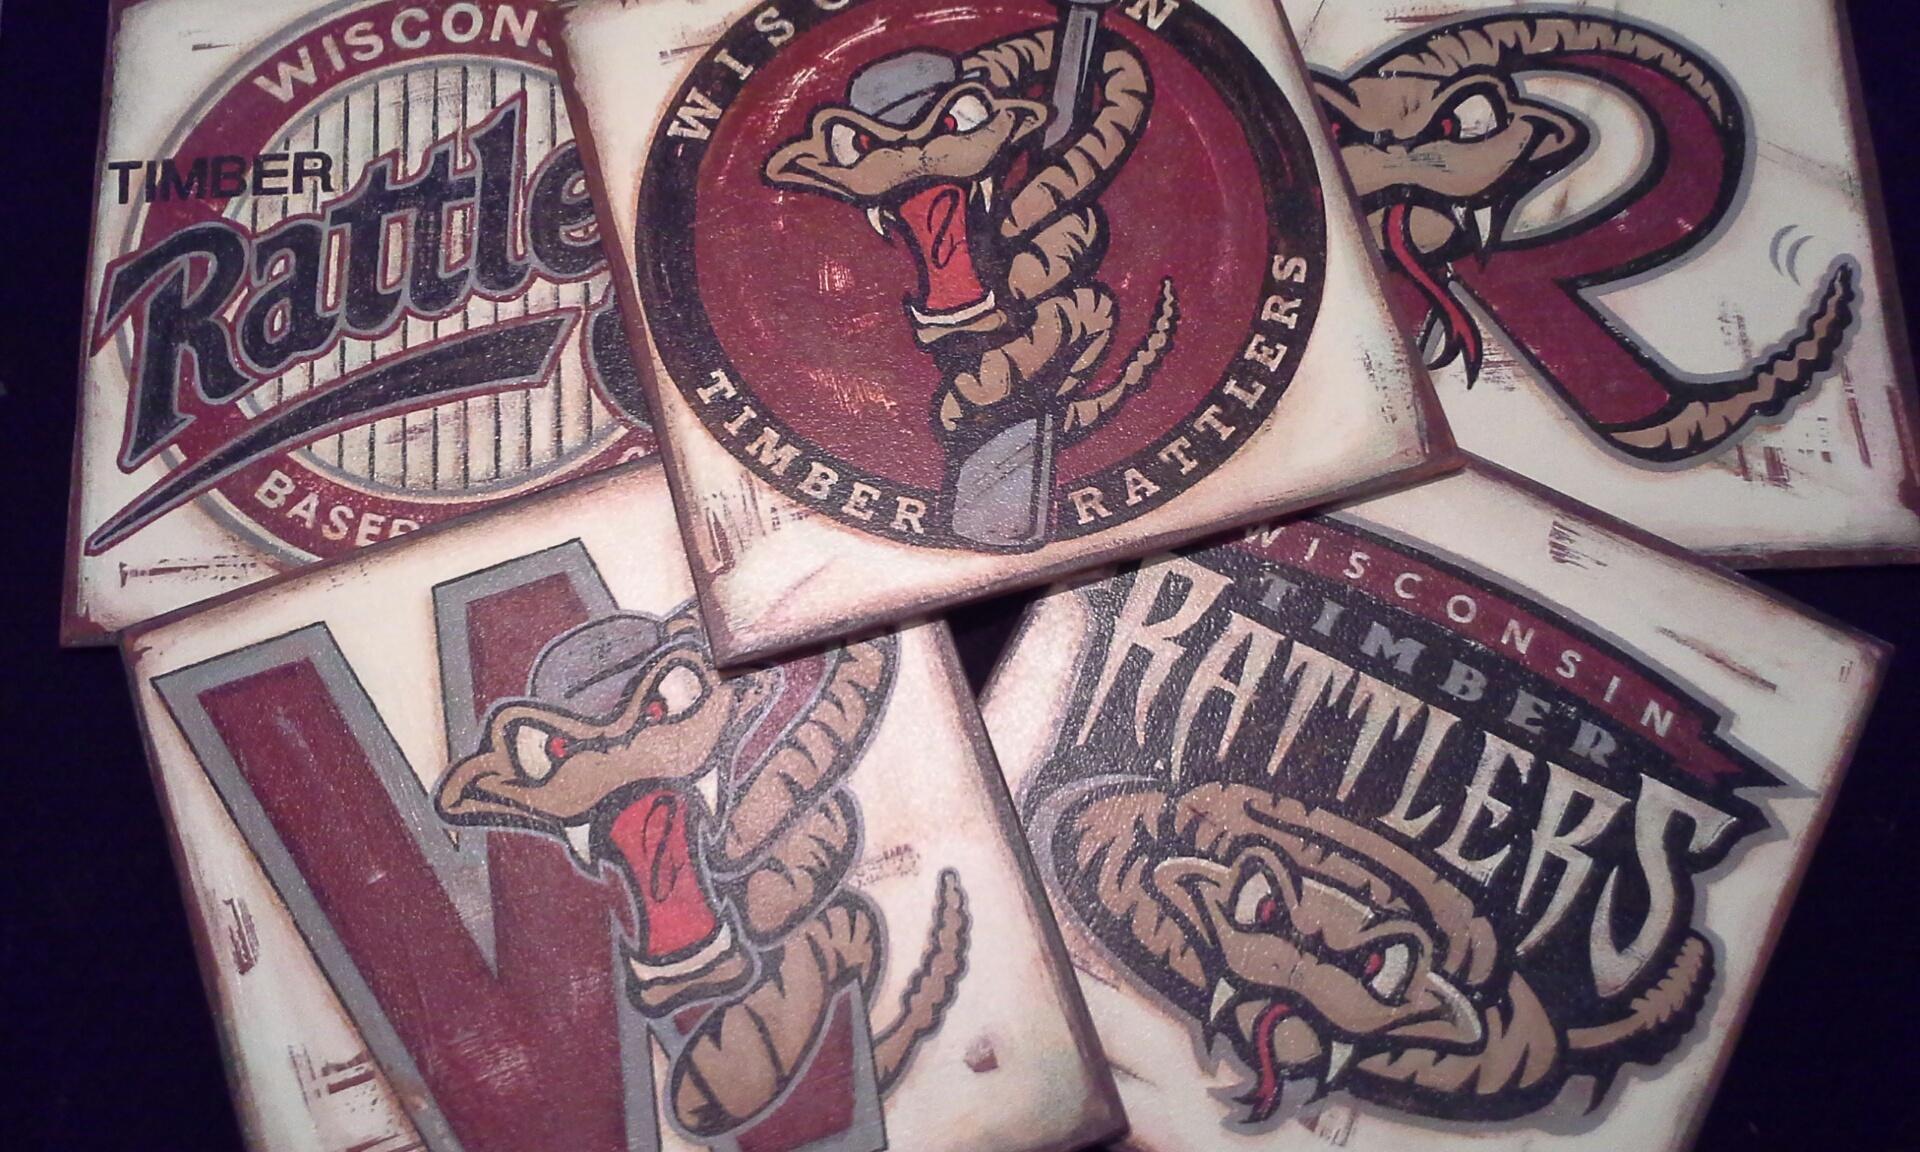 Timber Rattlers logos